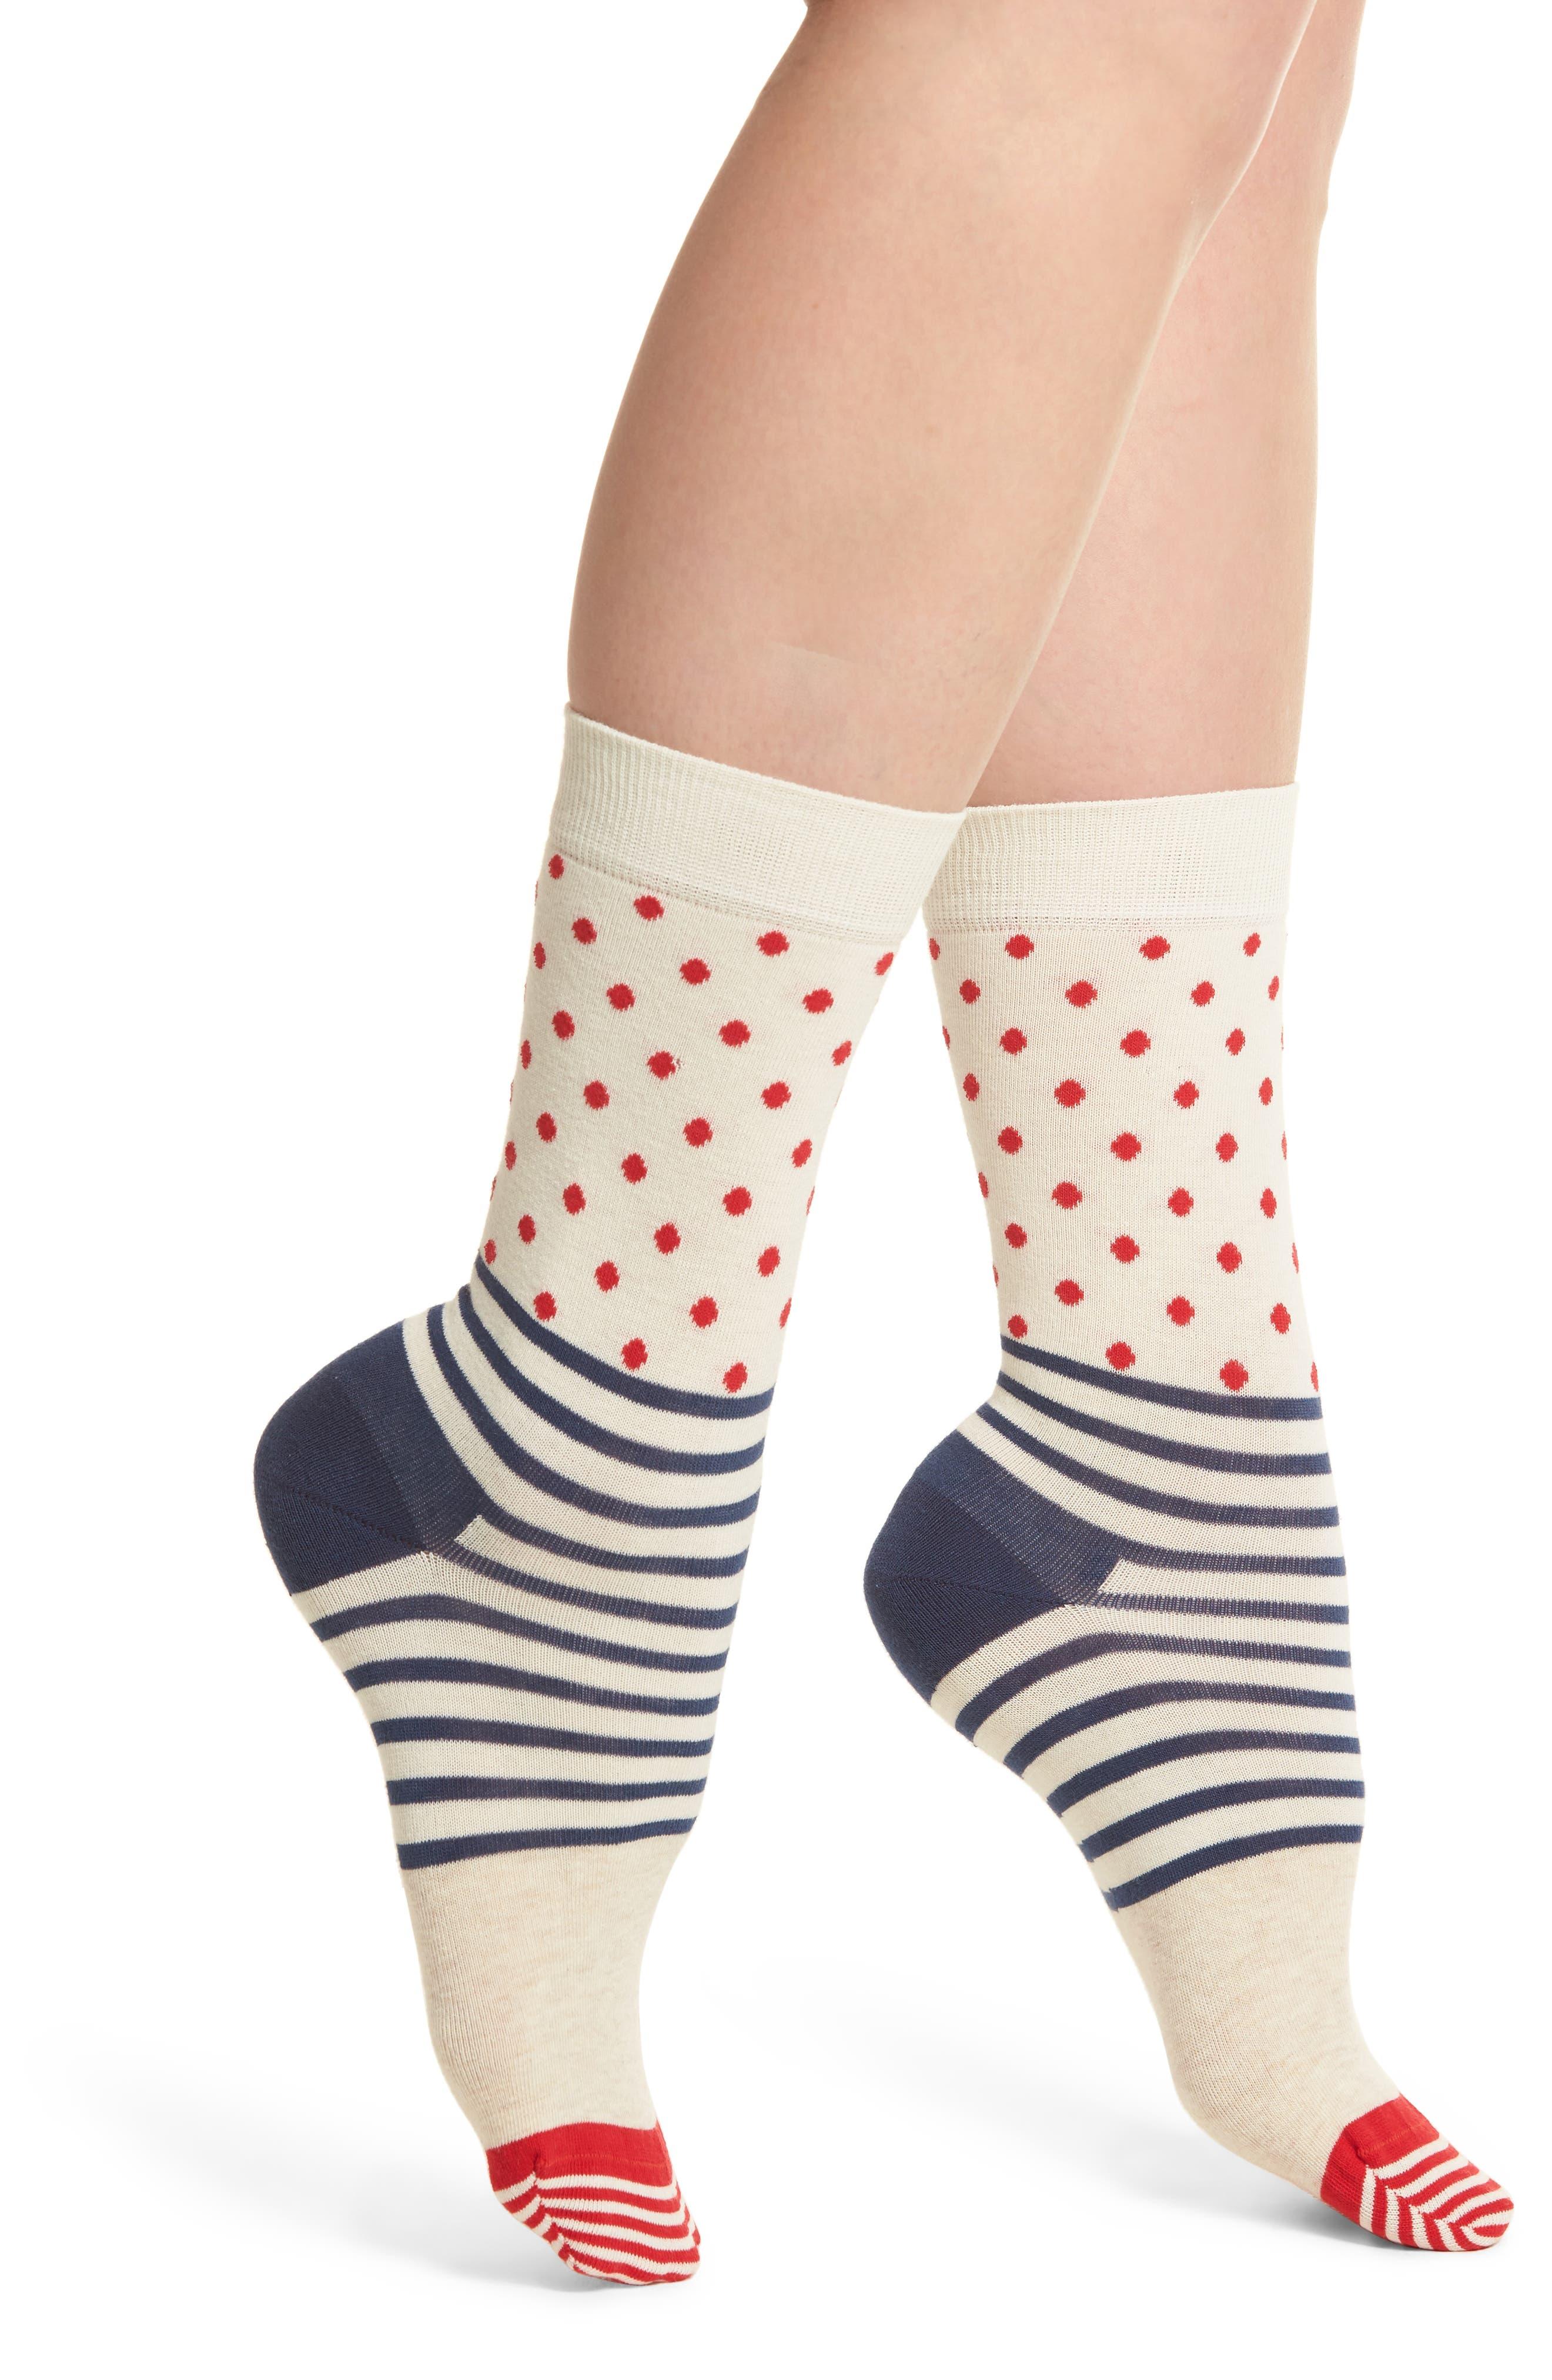 Happy Socks Stripes & Dots Crew Socks